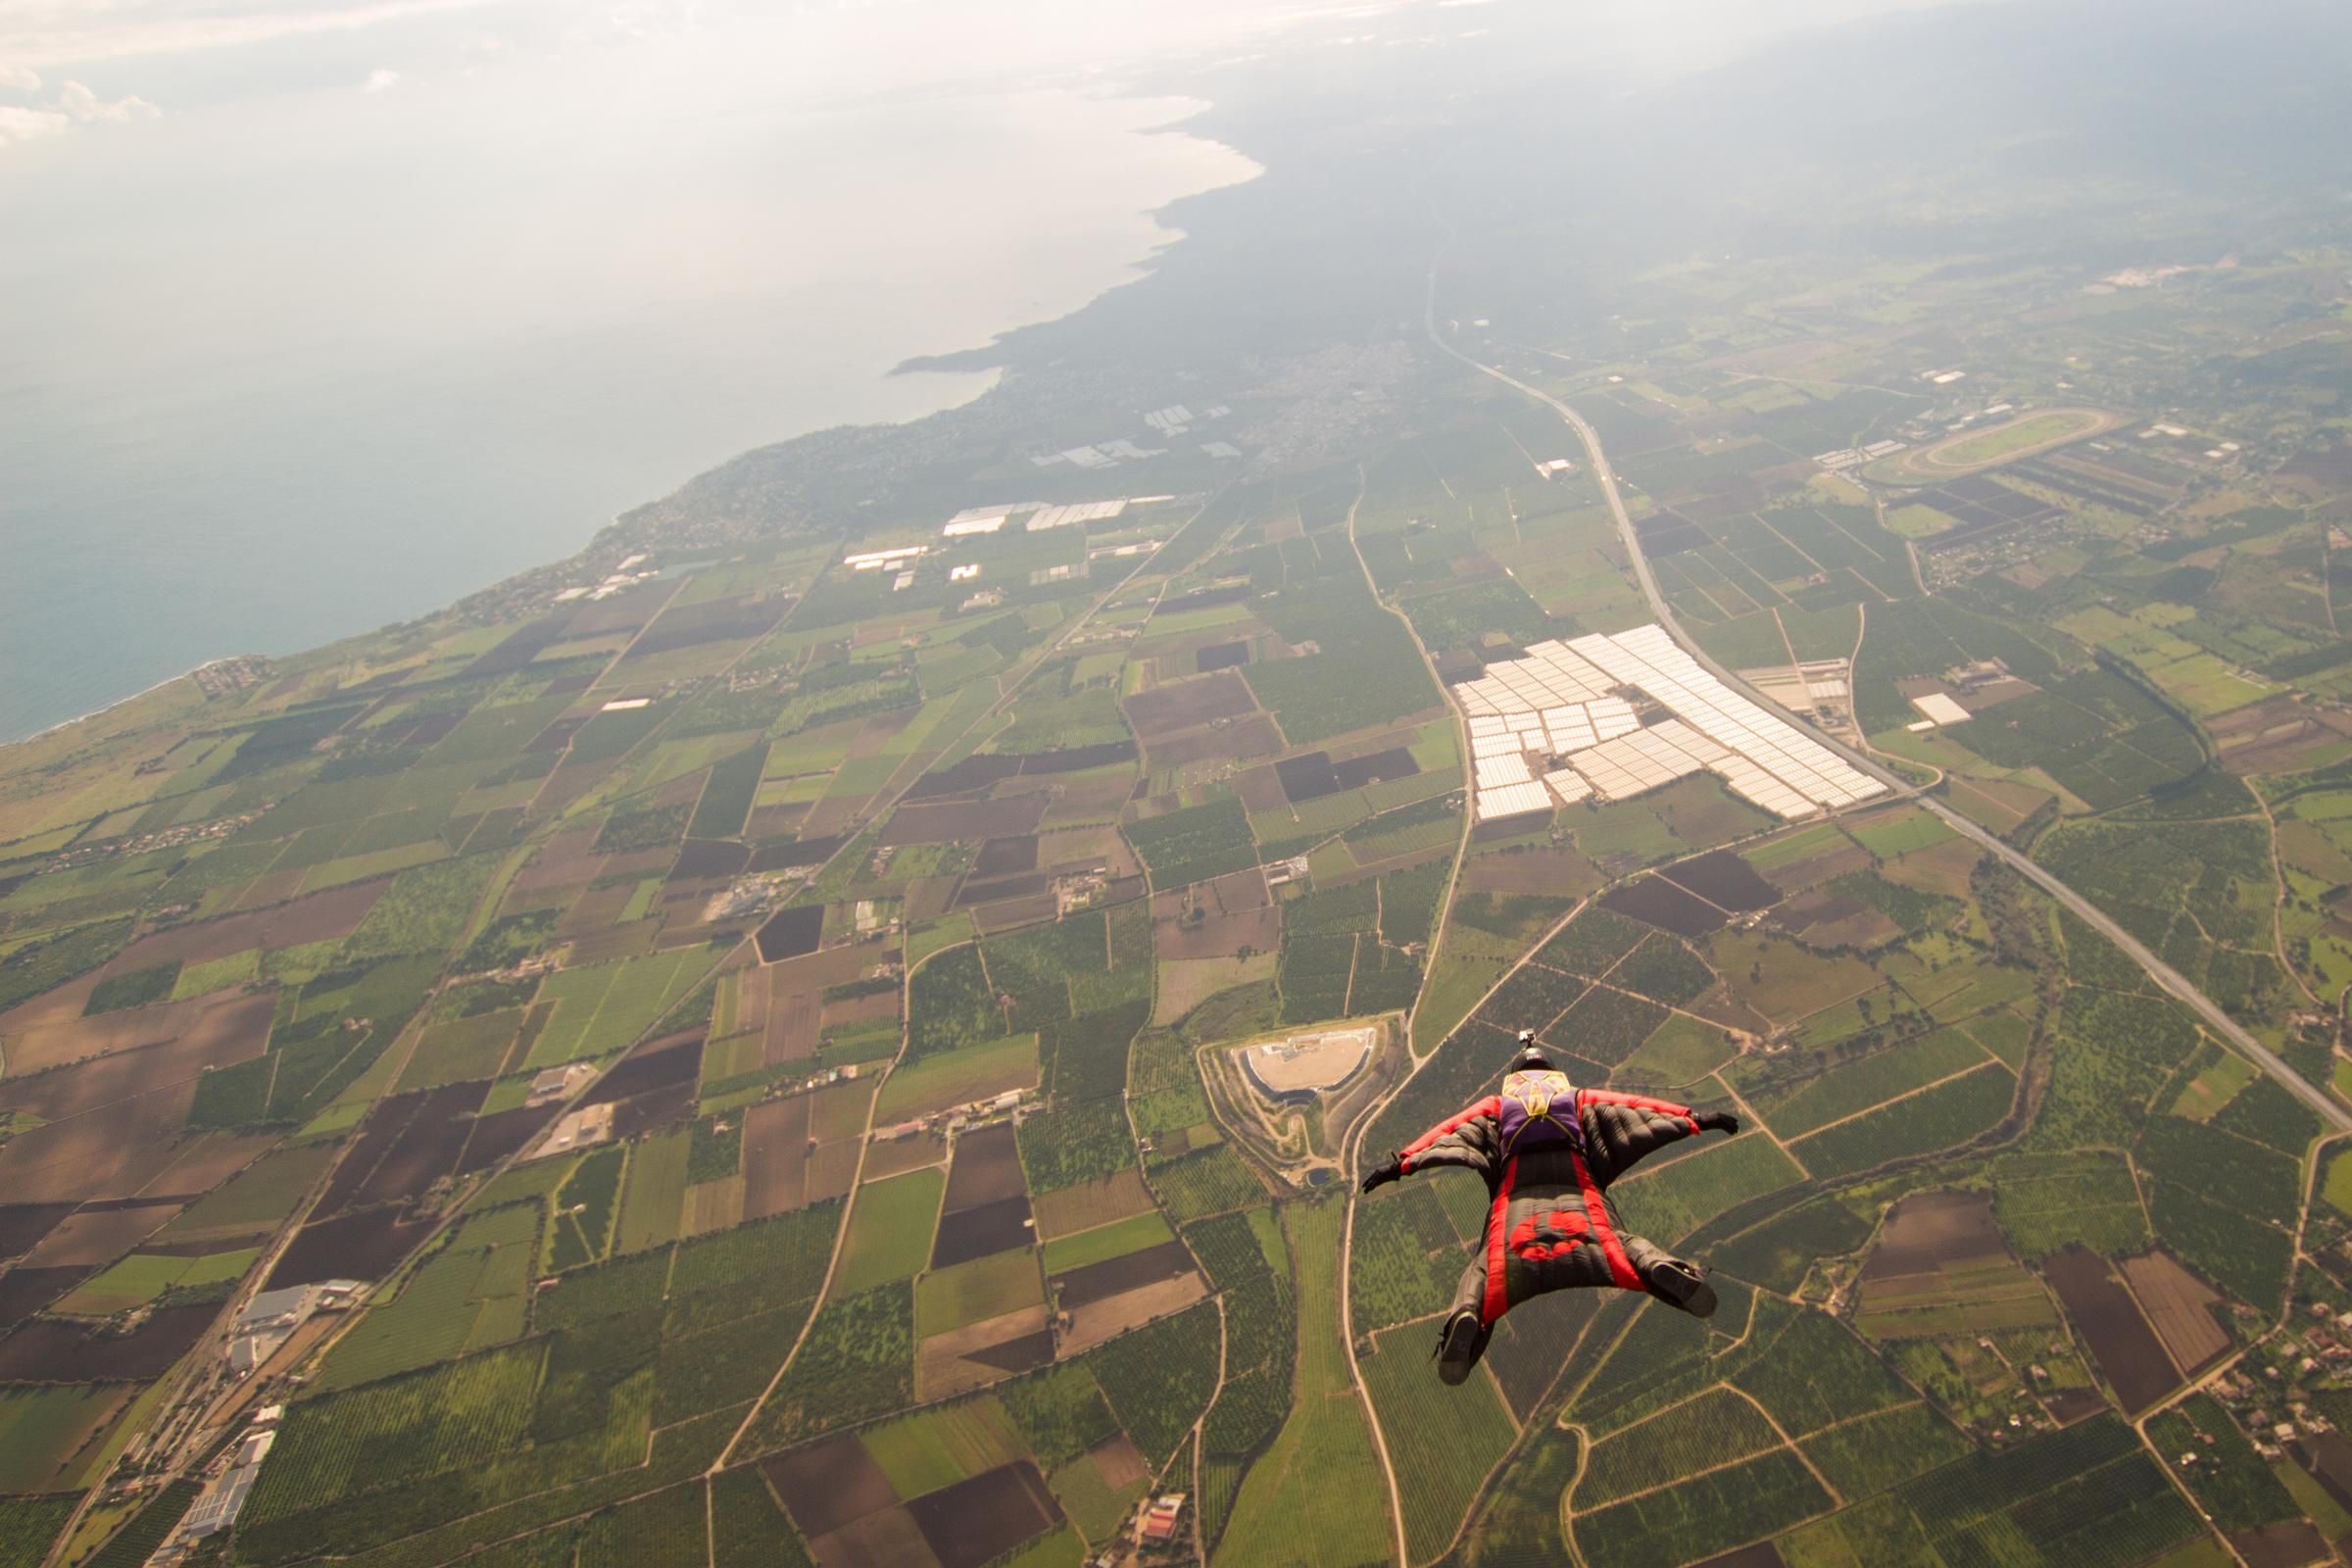 Flying over Sicily